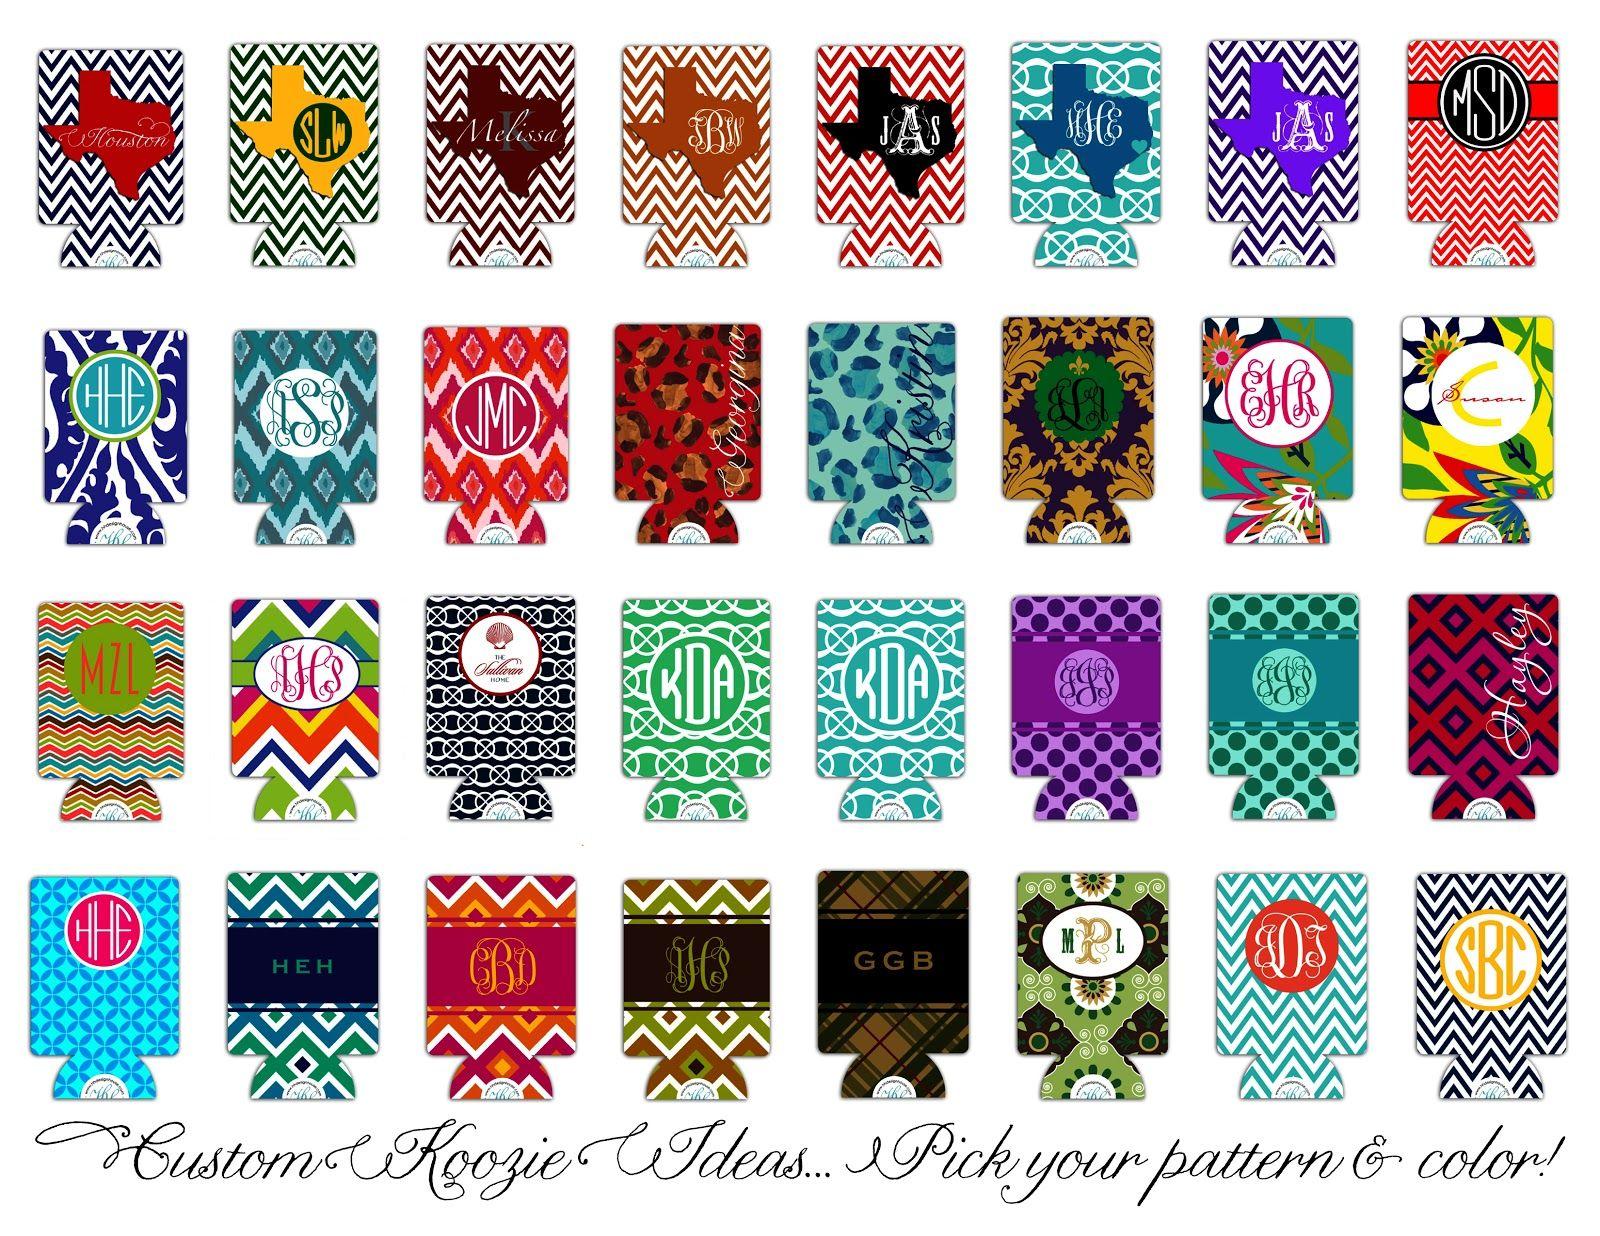 Wedding Koozie Design Ideas - Custom Printed #wedding #koozies are ...